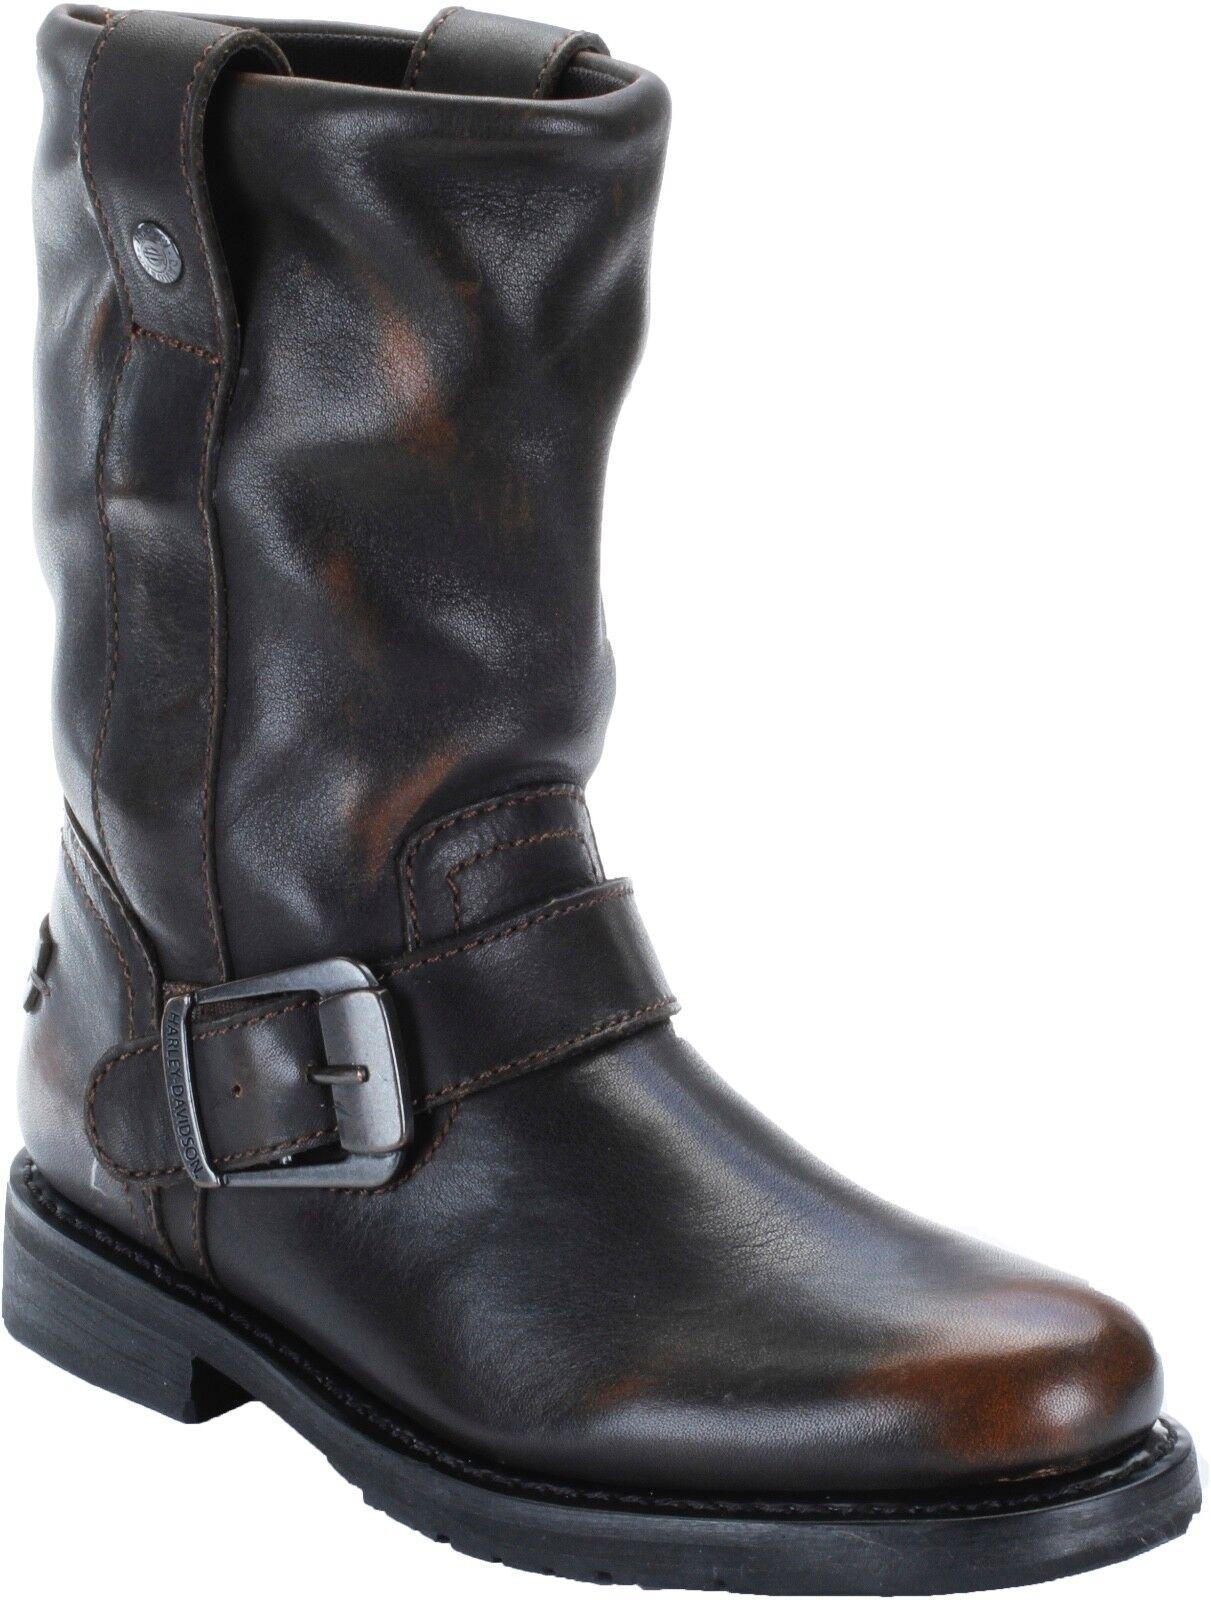 NEW Harley-Davidson Women's Boots D85417 Size 5.5 Medium